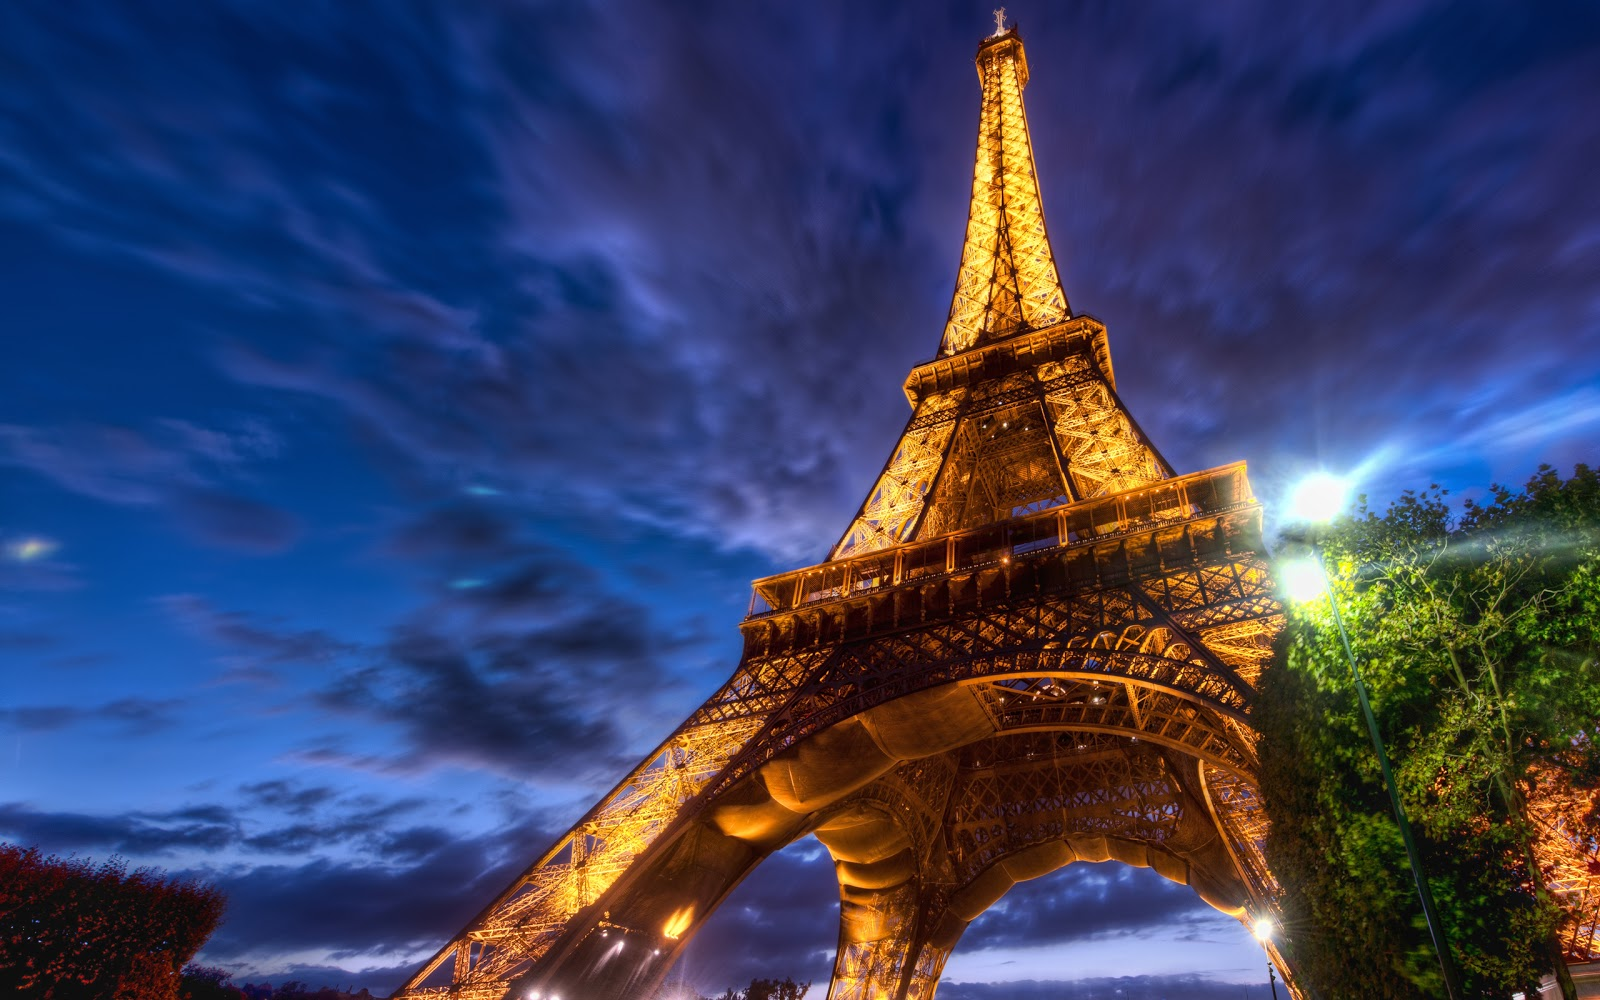 Artikel Kenakalan Remaja Kenakalan Remaja Belajarpsikologi Prancis Kreatifnya Kelas B